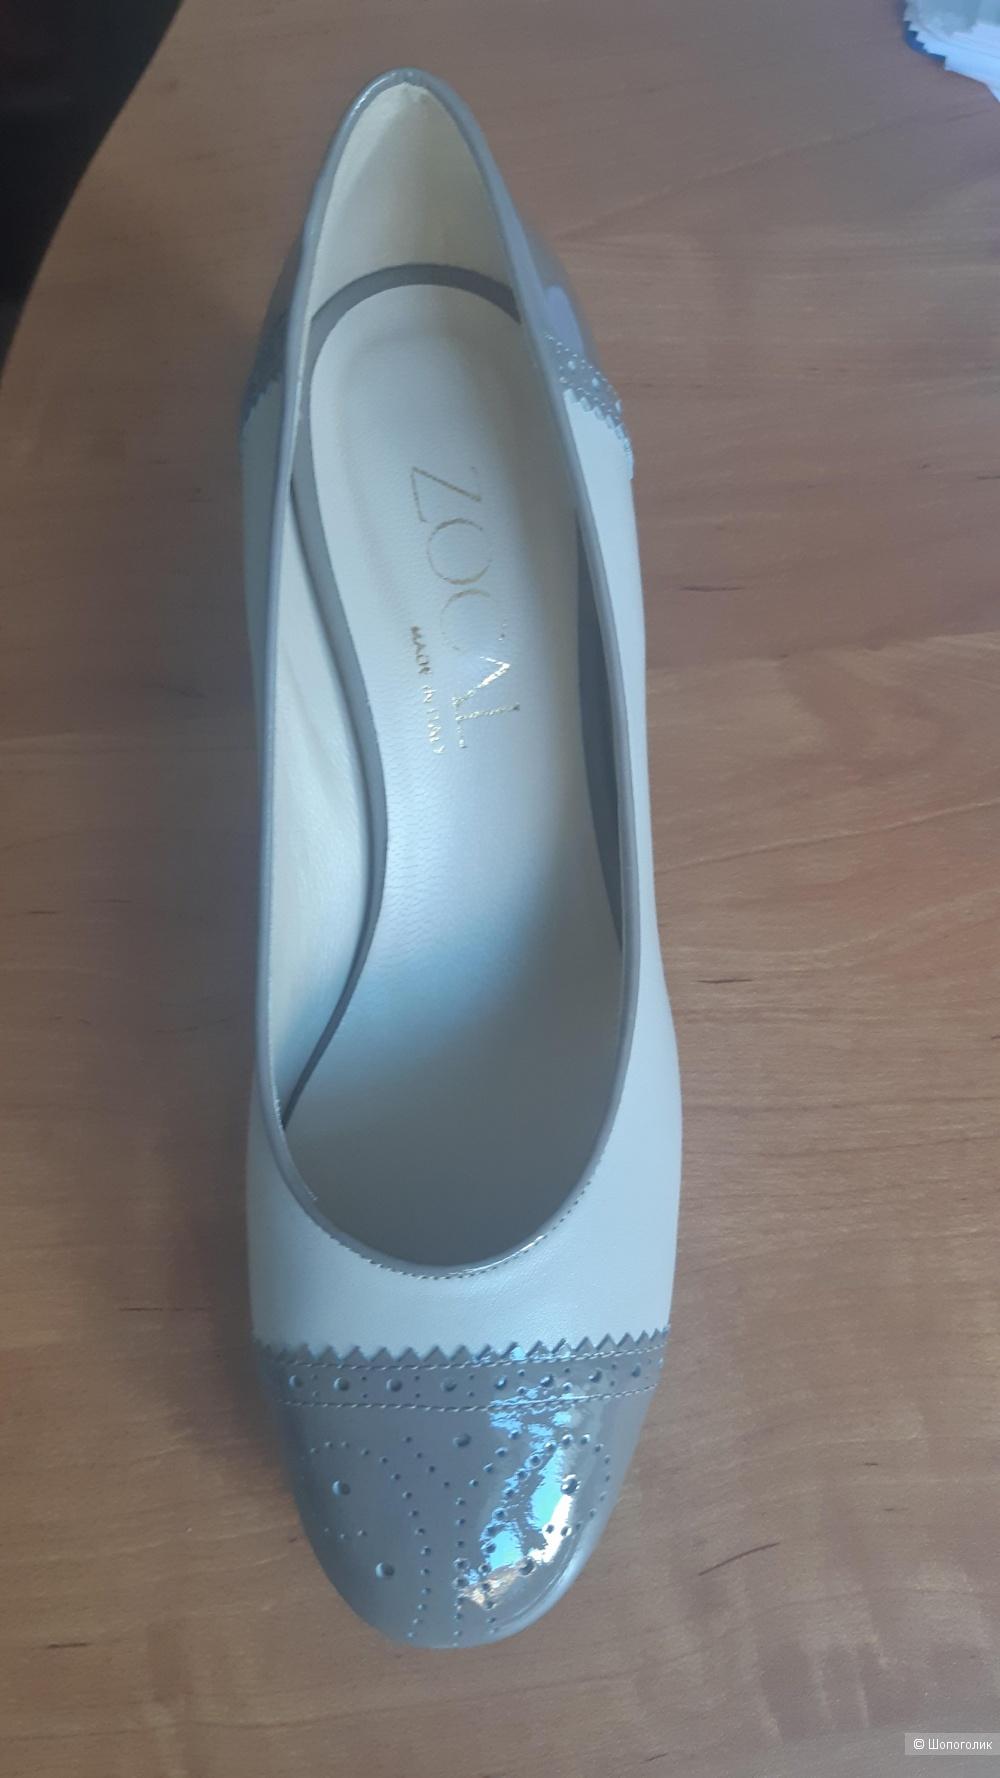 Туфли Zocal размер по маркировке 36.5 на 37 р-р